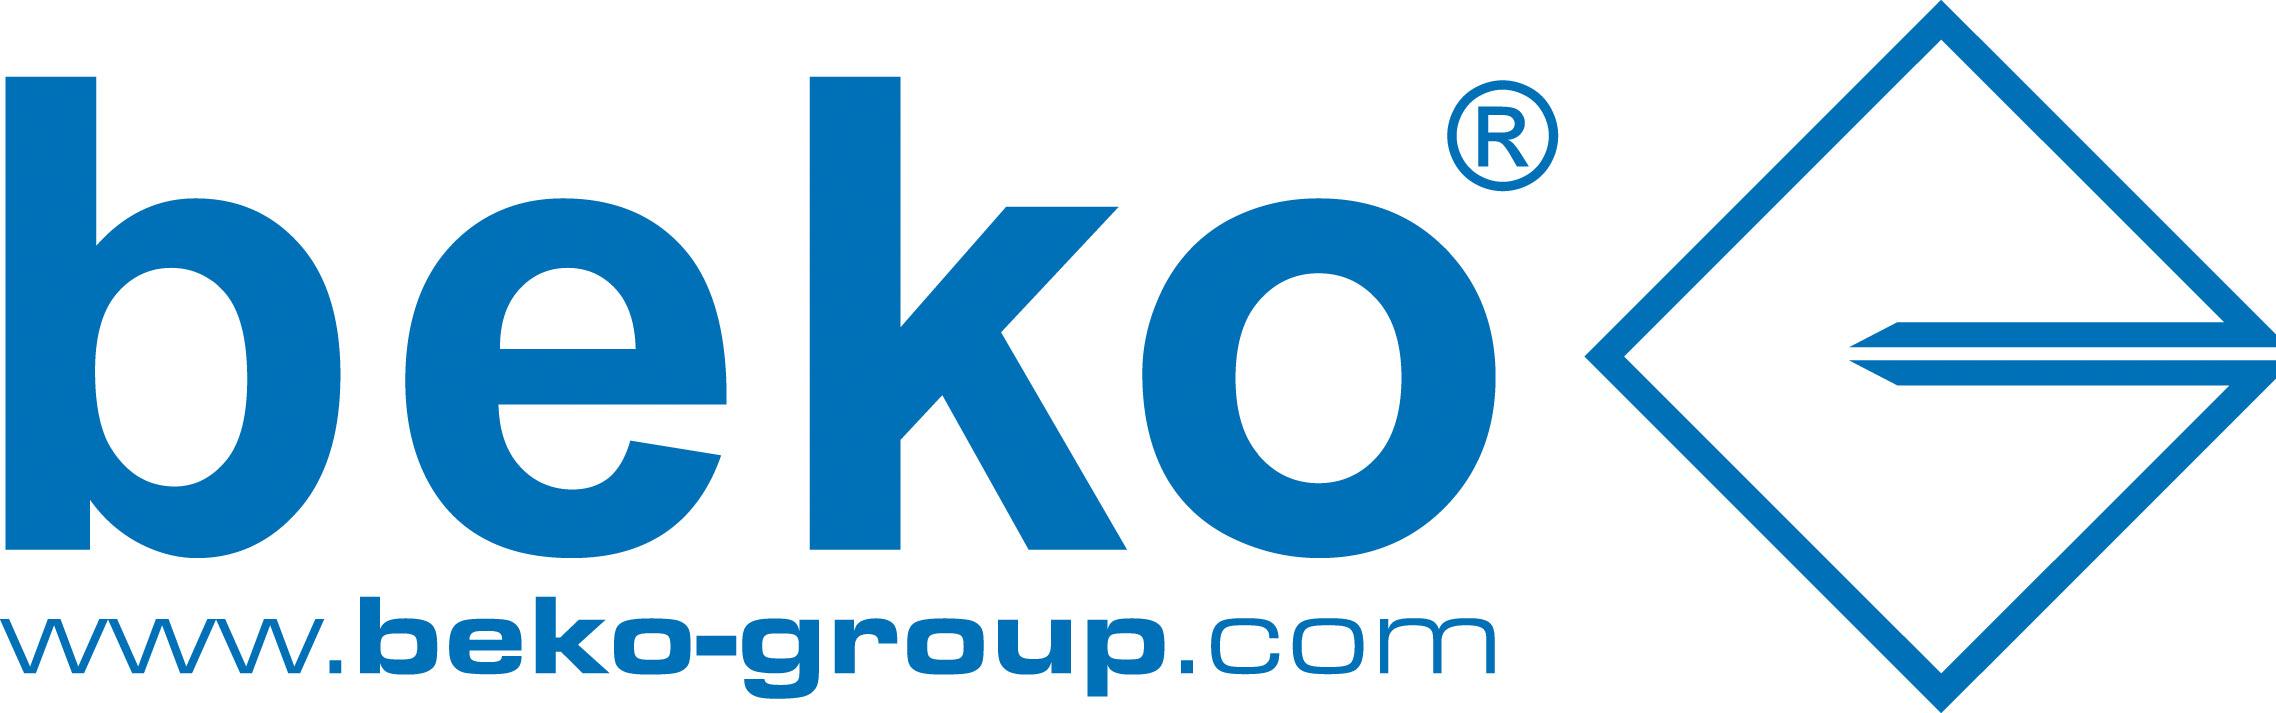 beko-Logo +web